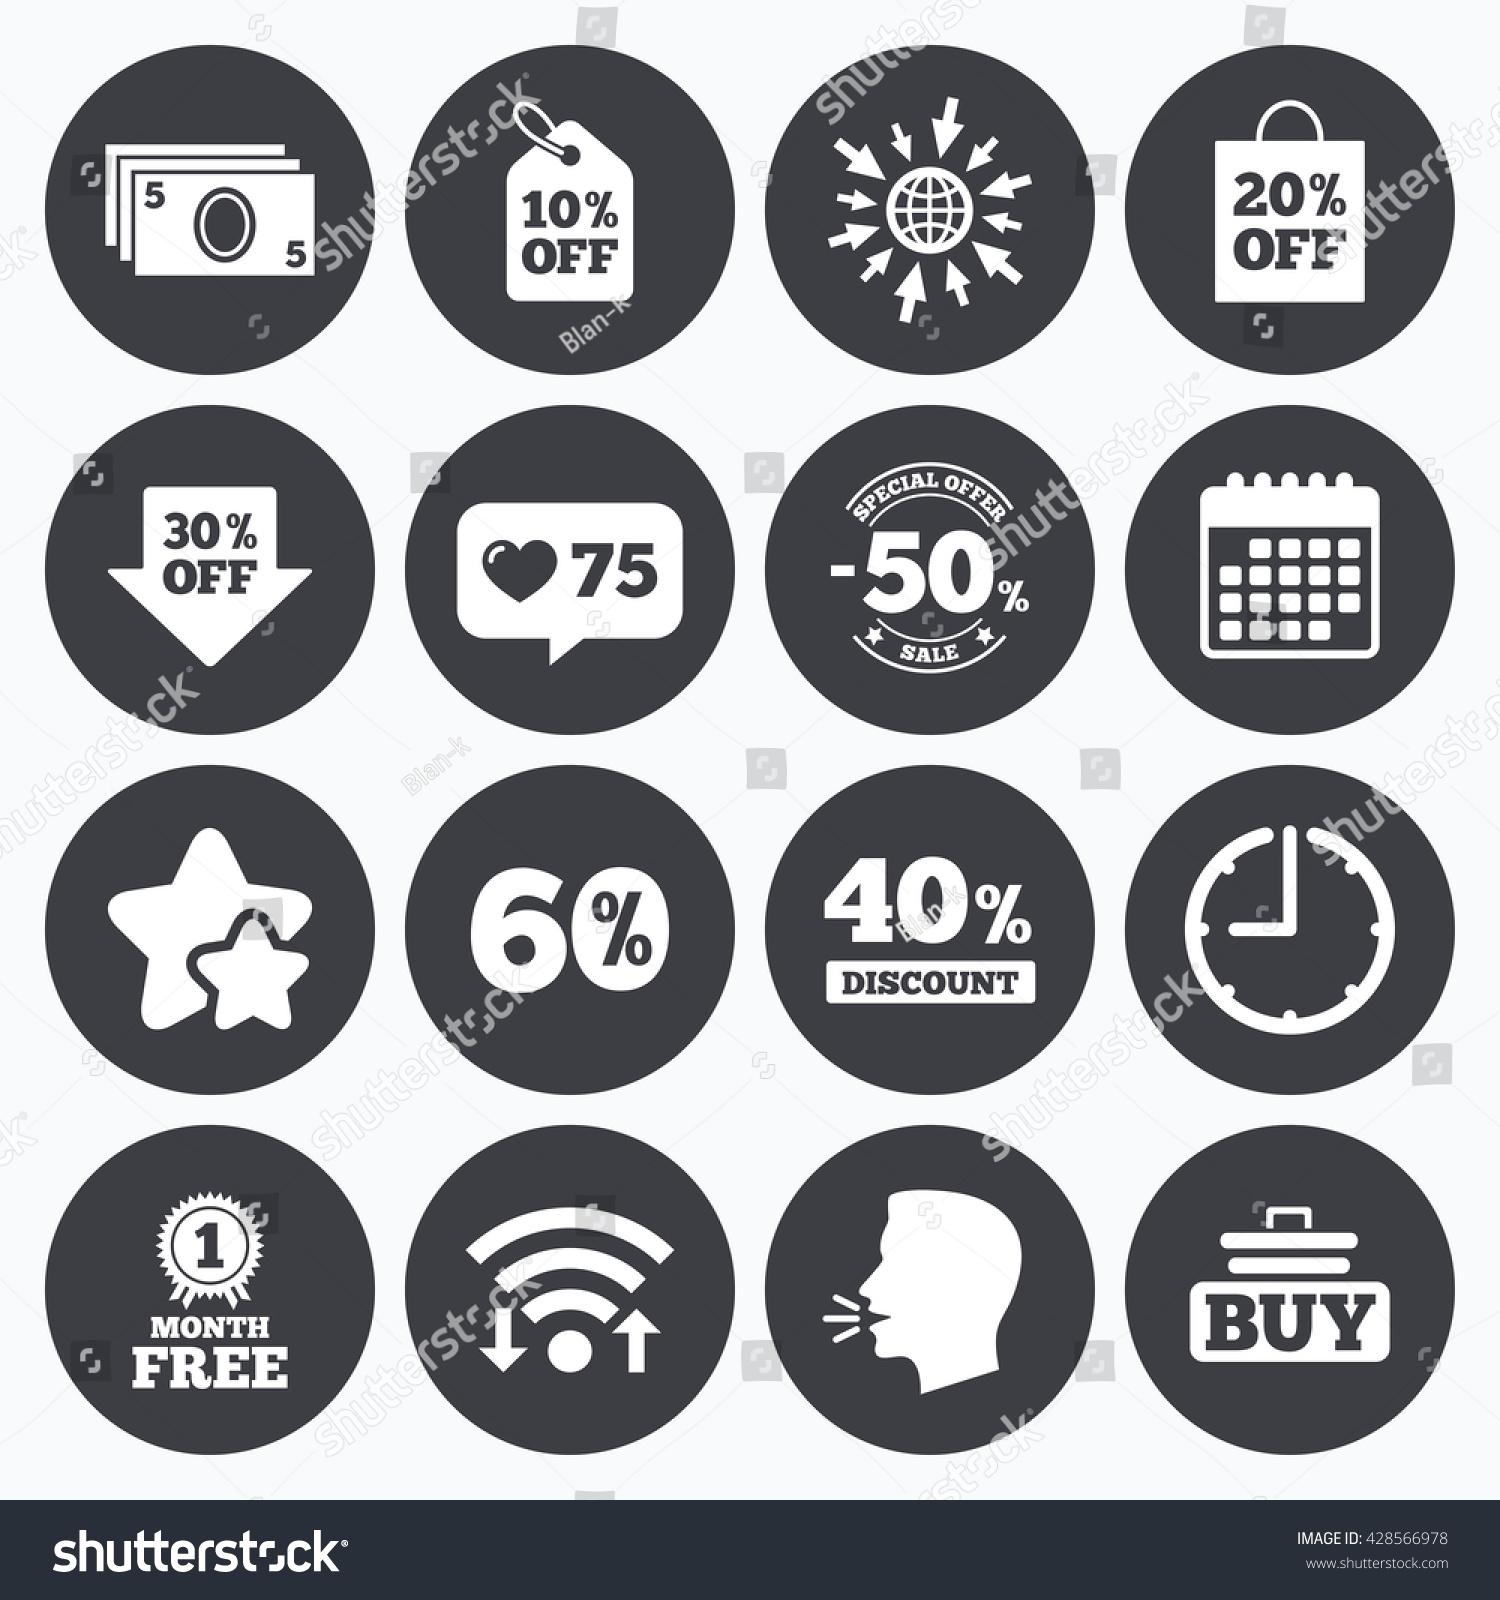 Calendar Wifi Clock Symbols Like Counter Stock Vector (Royalty Free ...